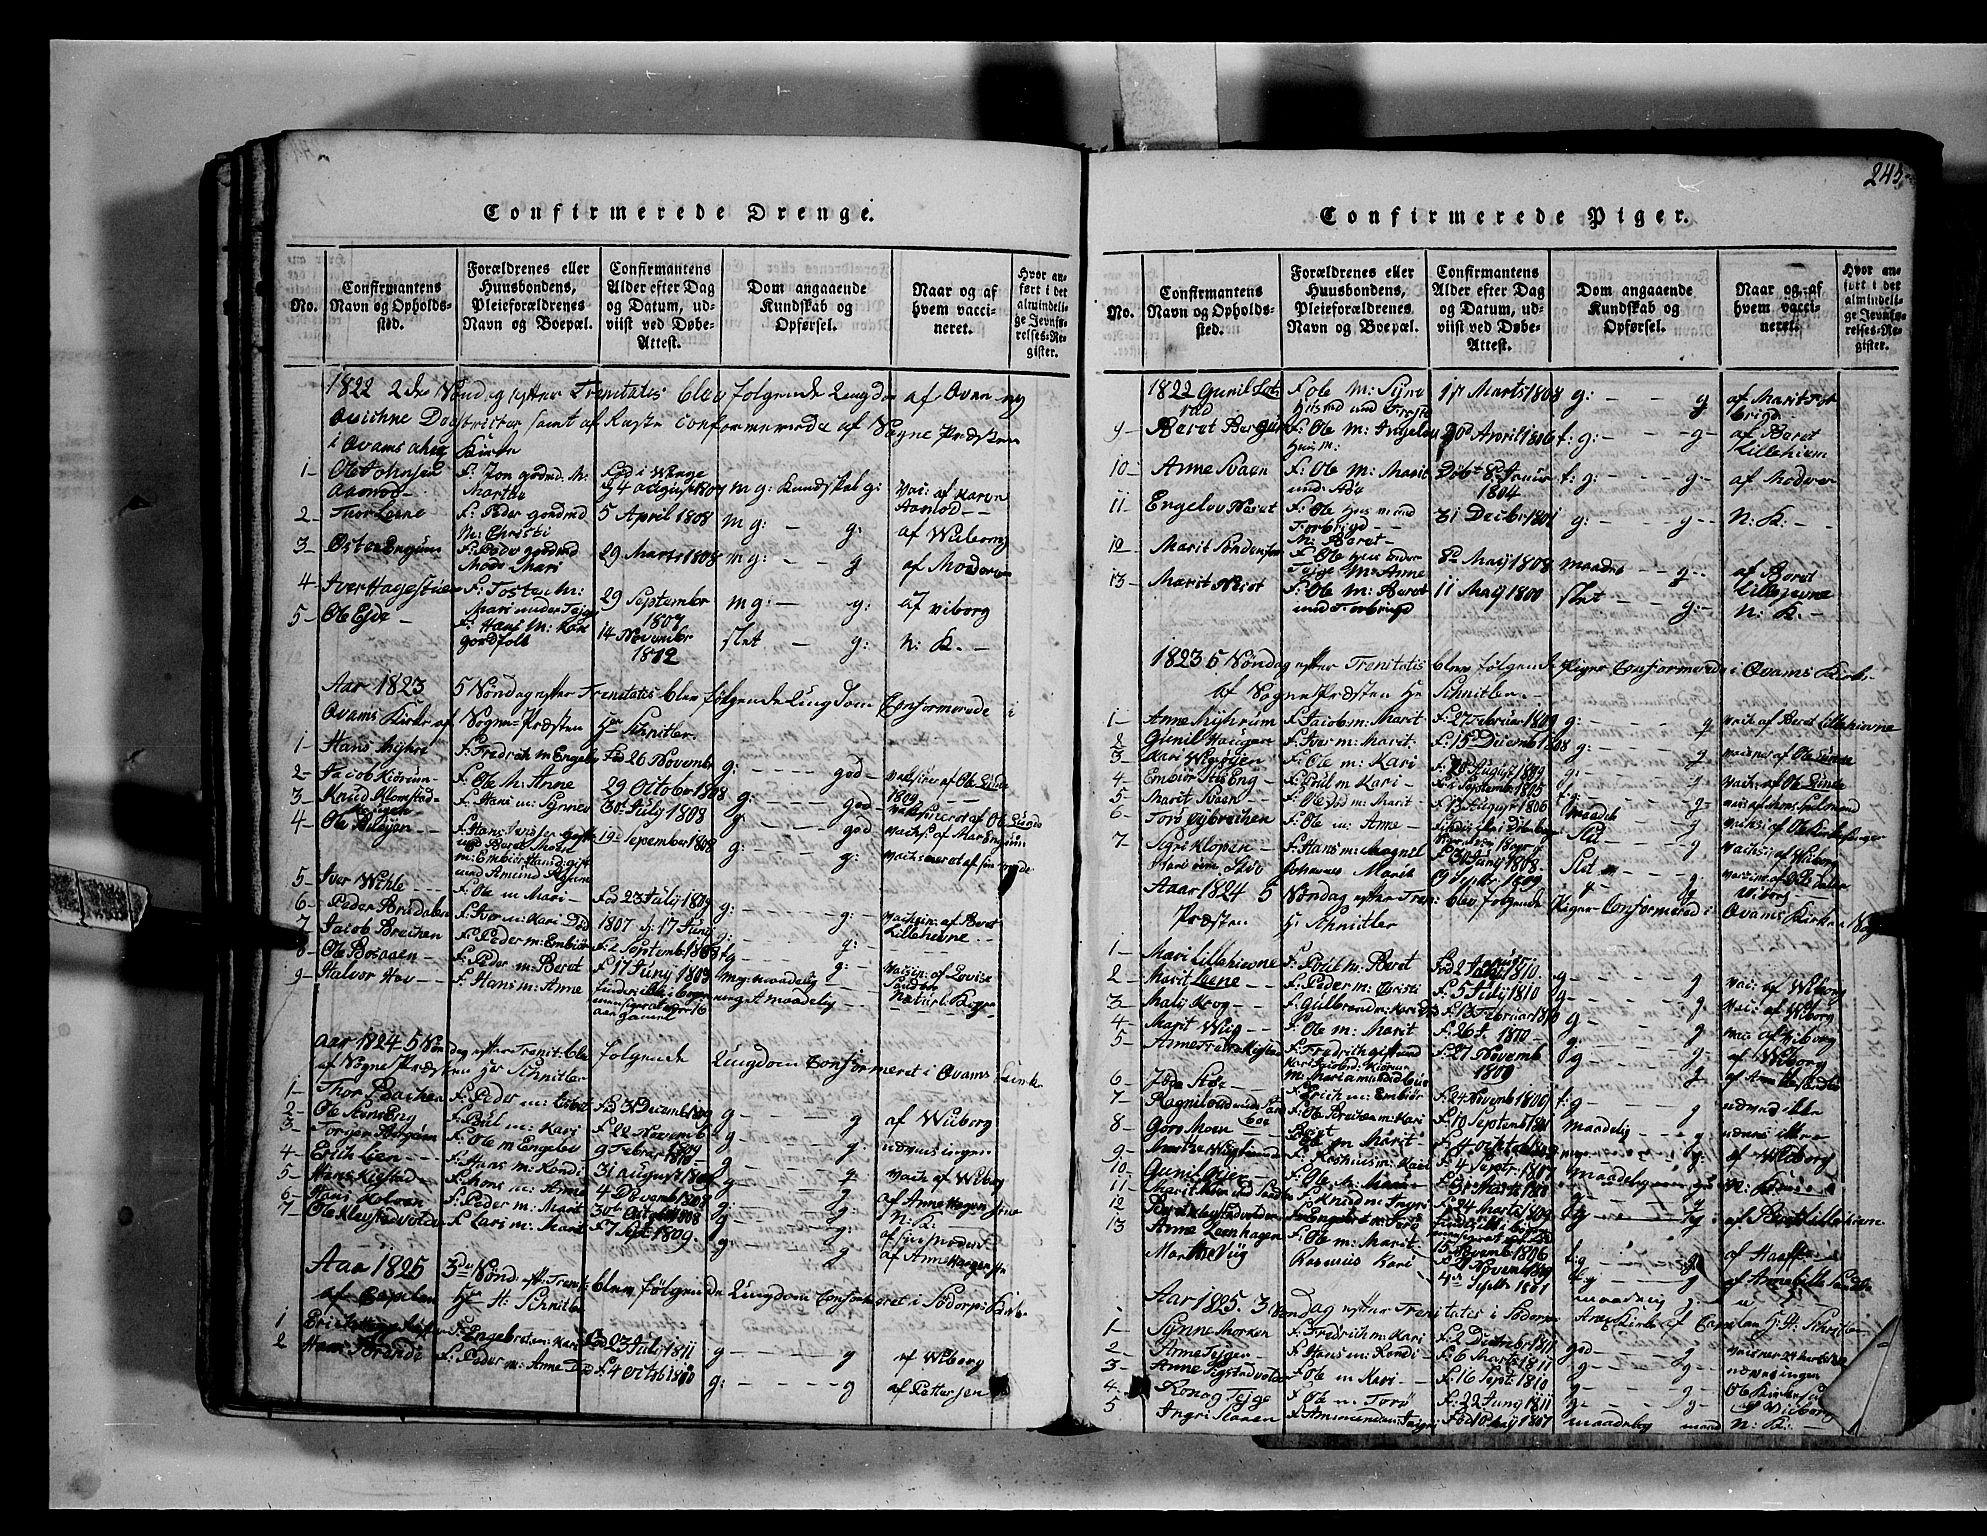 SAH, Fron prestekontor, H/Ha/Hab/L0002: Klokkerbok nr. 2, 1816-1850, s. 245